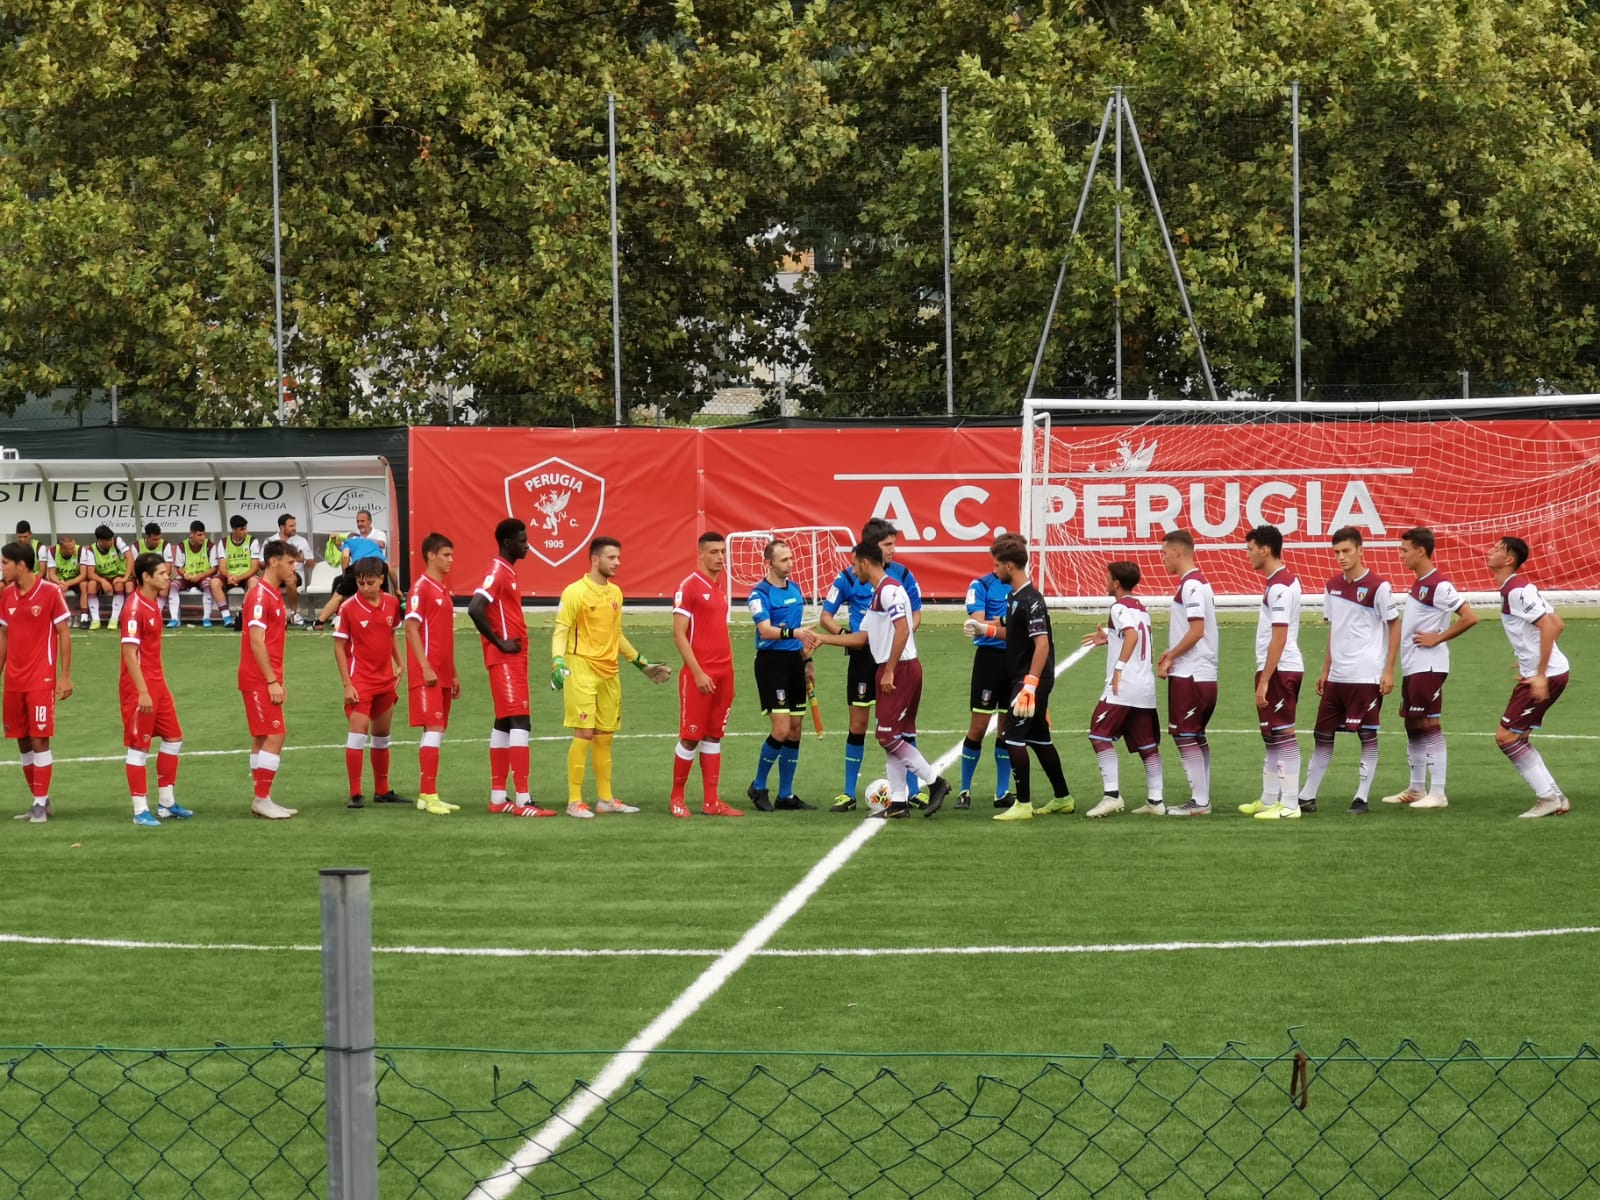 Coppa Italia Primavera: Perugia-Salernitana 4-5 dcr   A.C ...